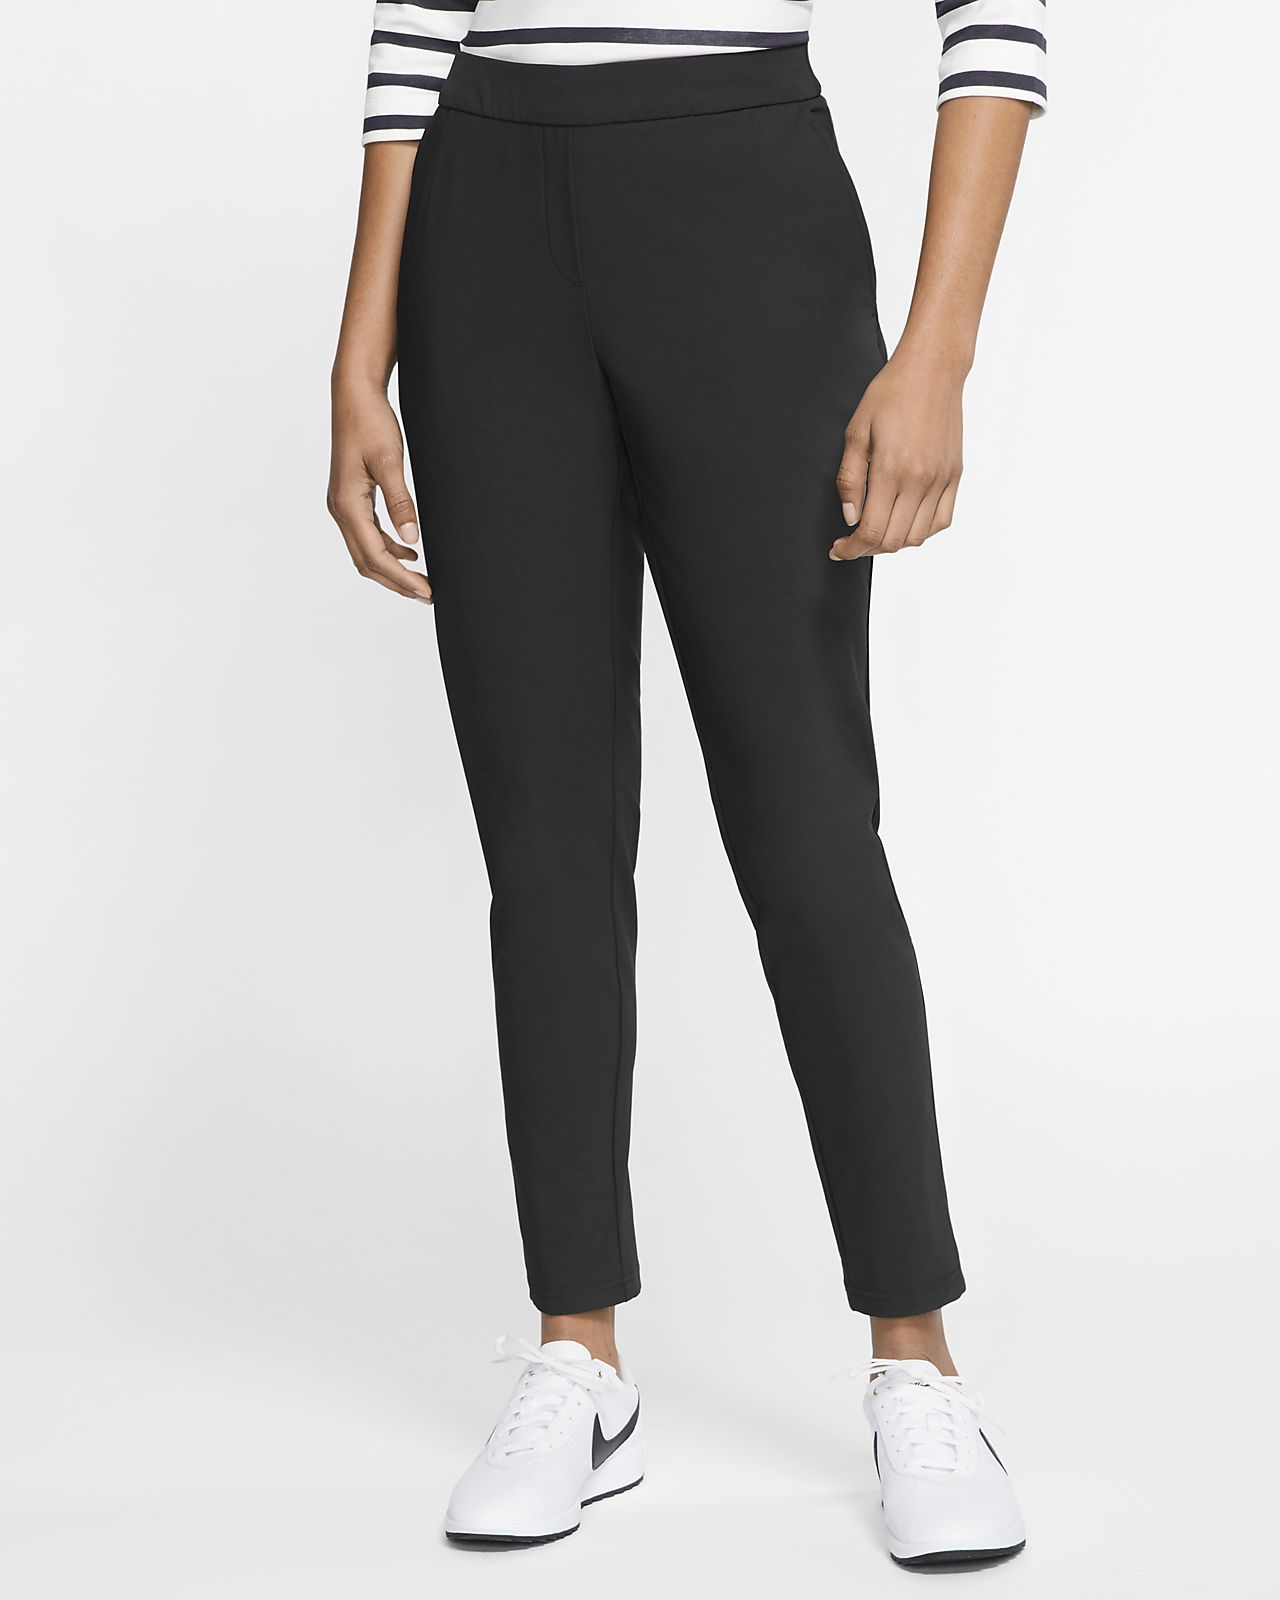 Nike Flex UV Victory Women's Golf Trousers